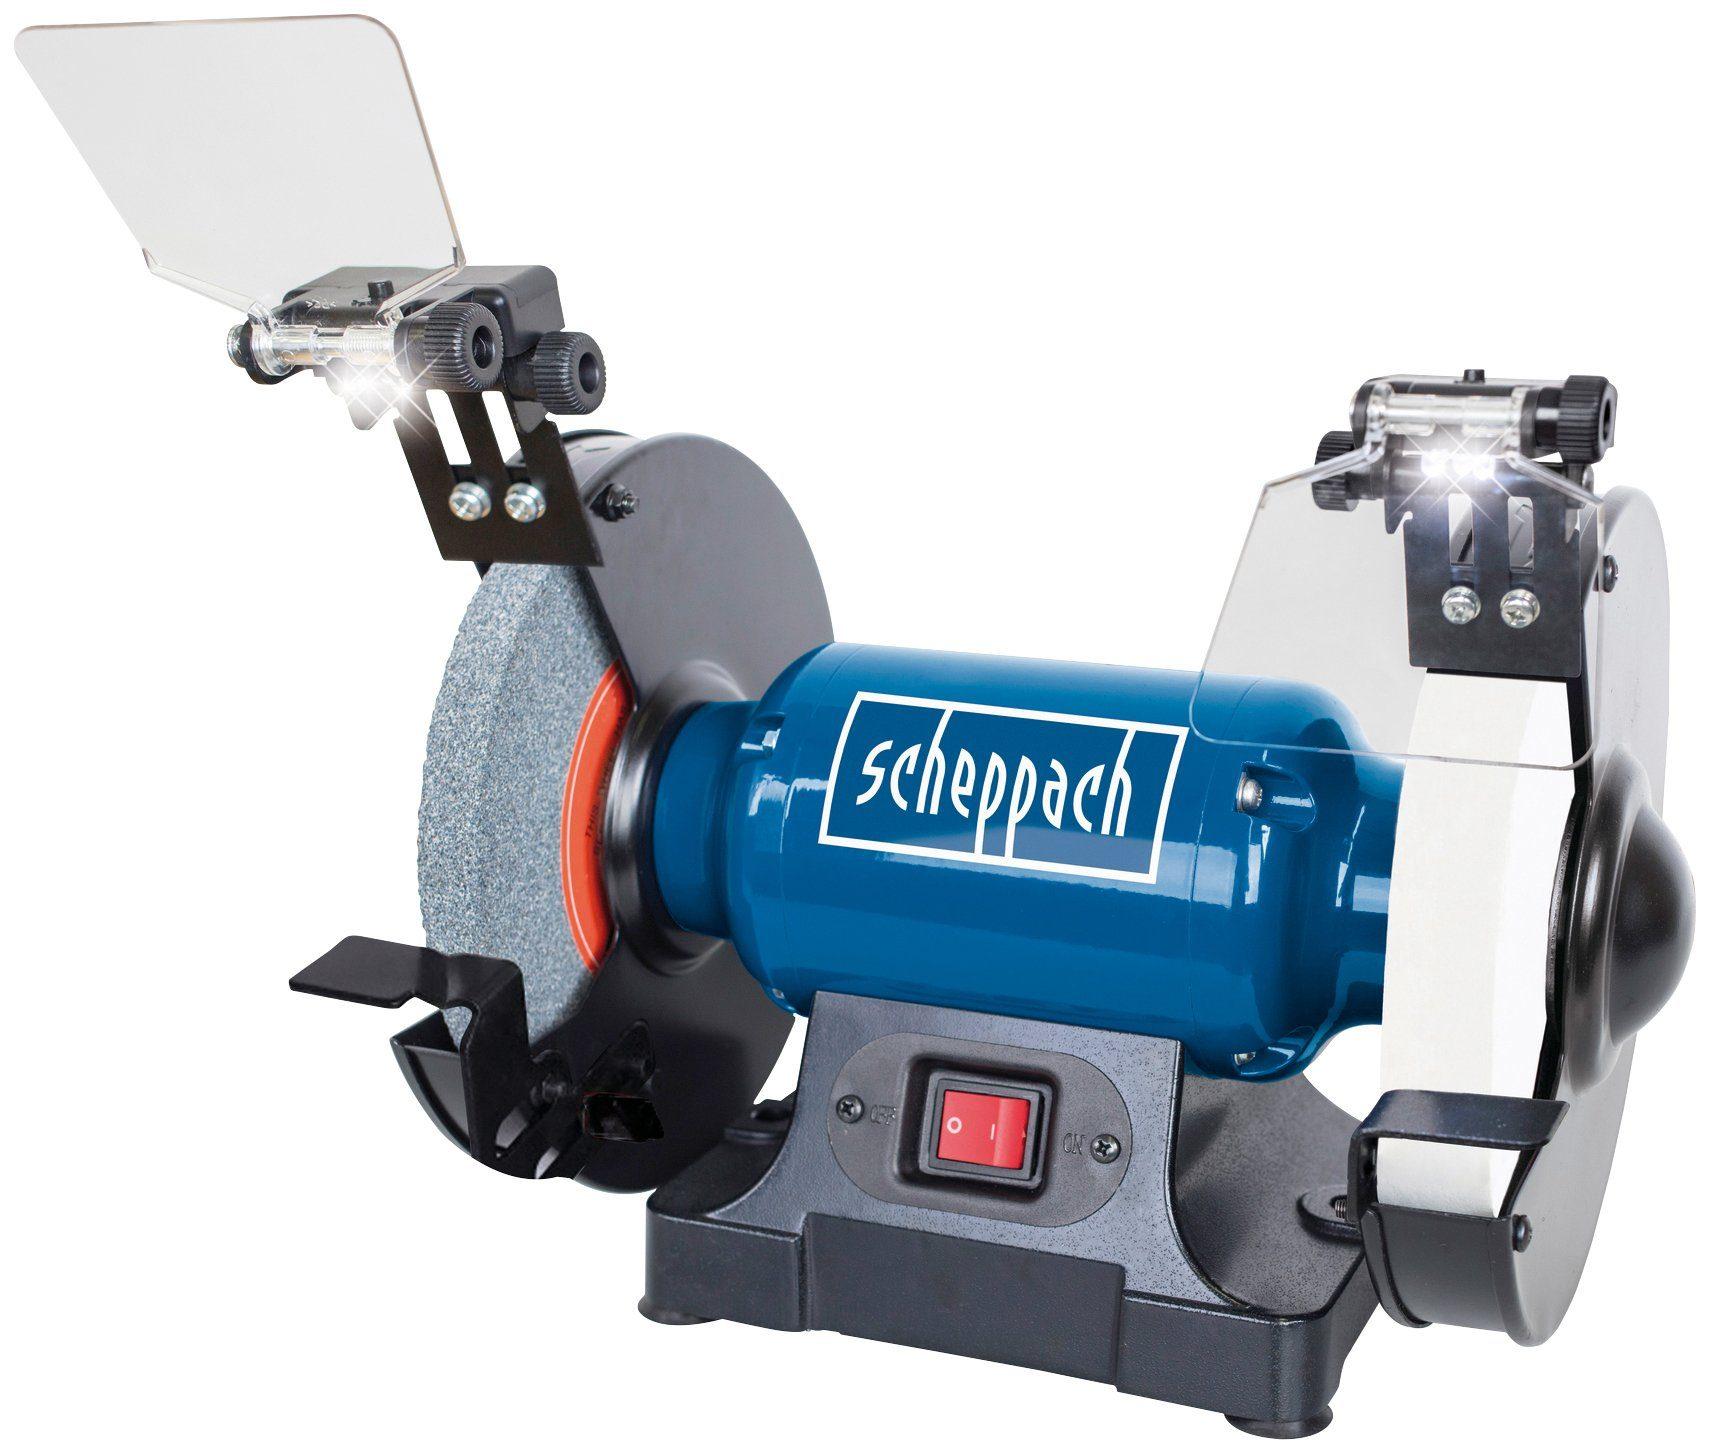 SCHEPPACH Doppelschleifer »SM200AL«, mit LED, 230-240V - 200mm